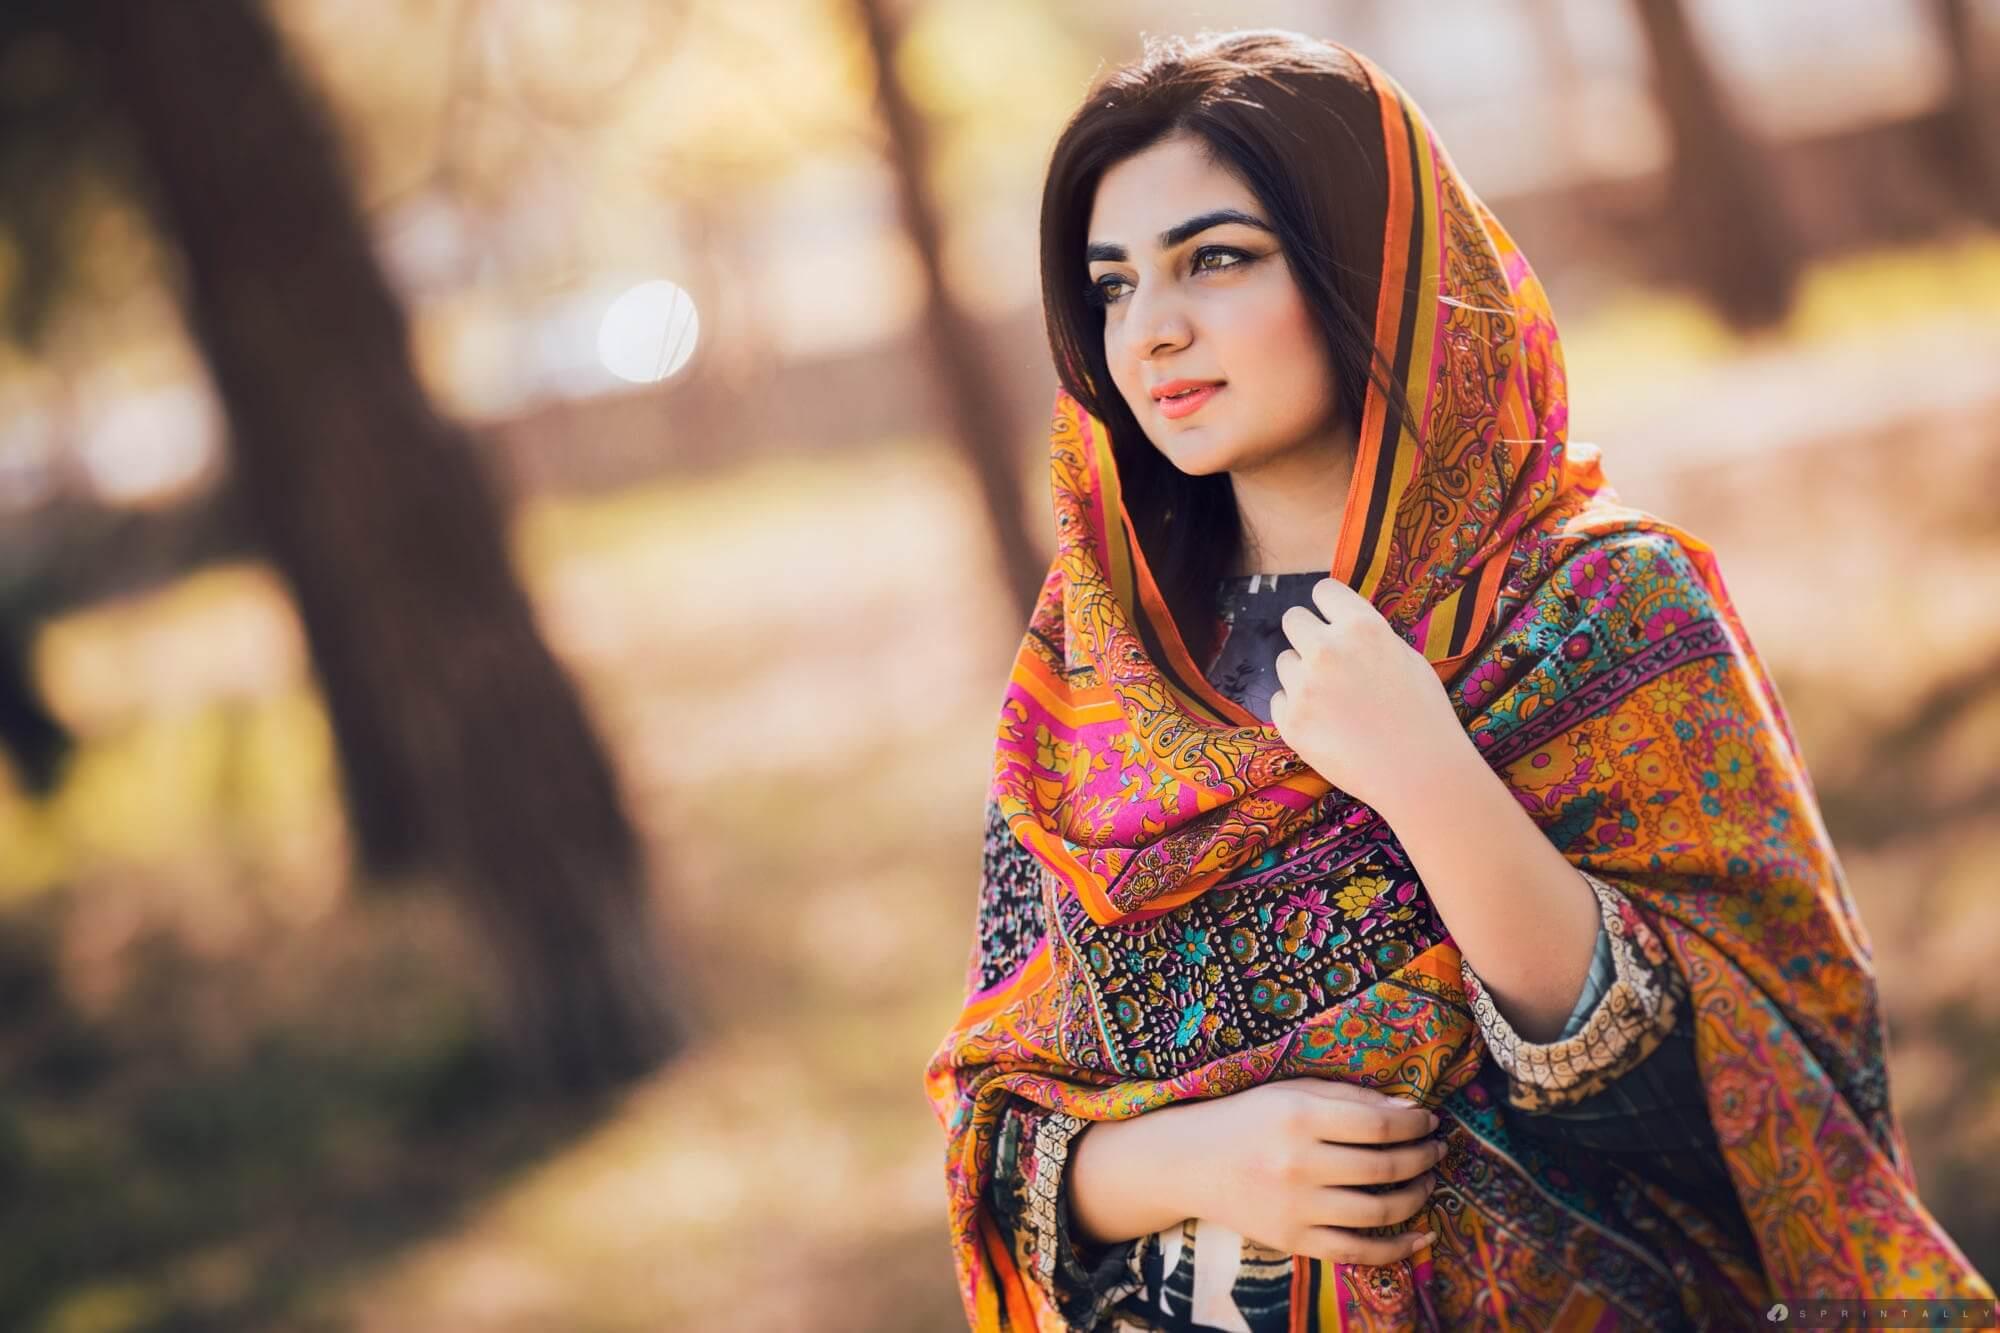 Girl most muslim beautiful world in Top 10